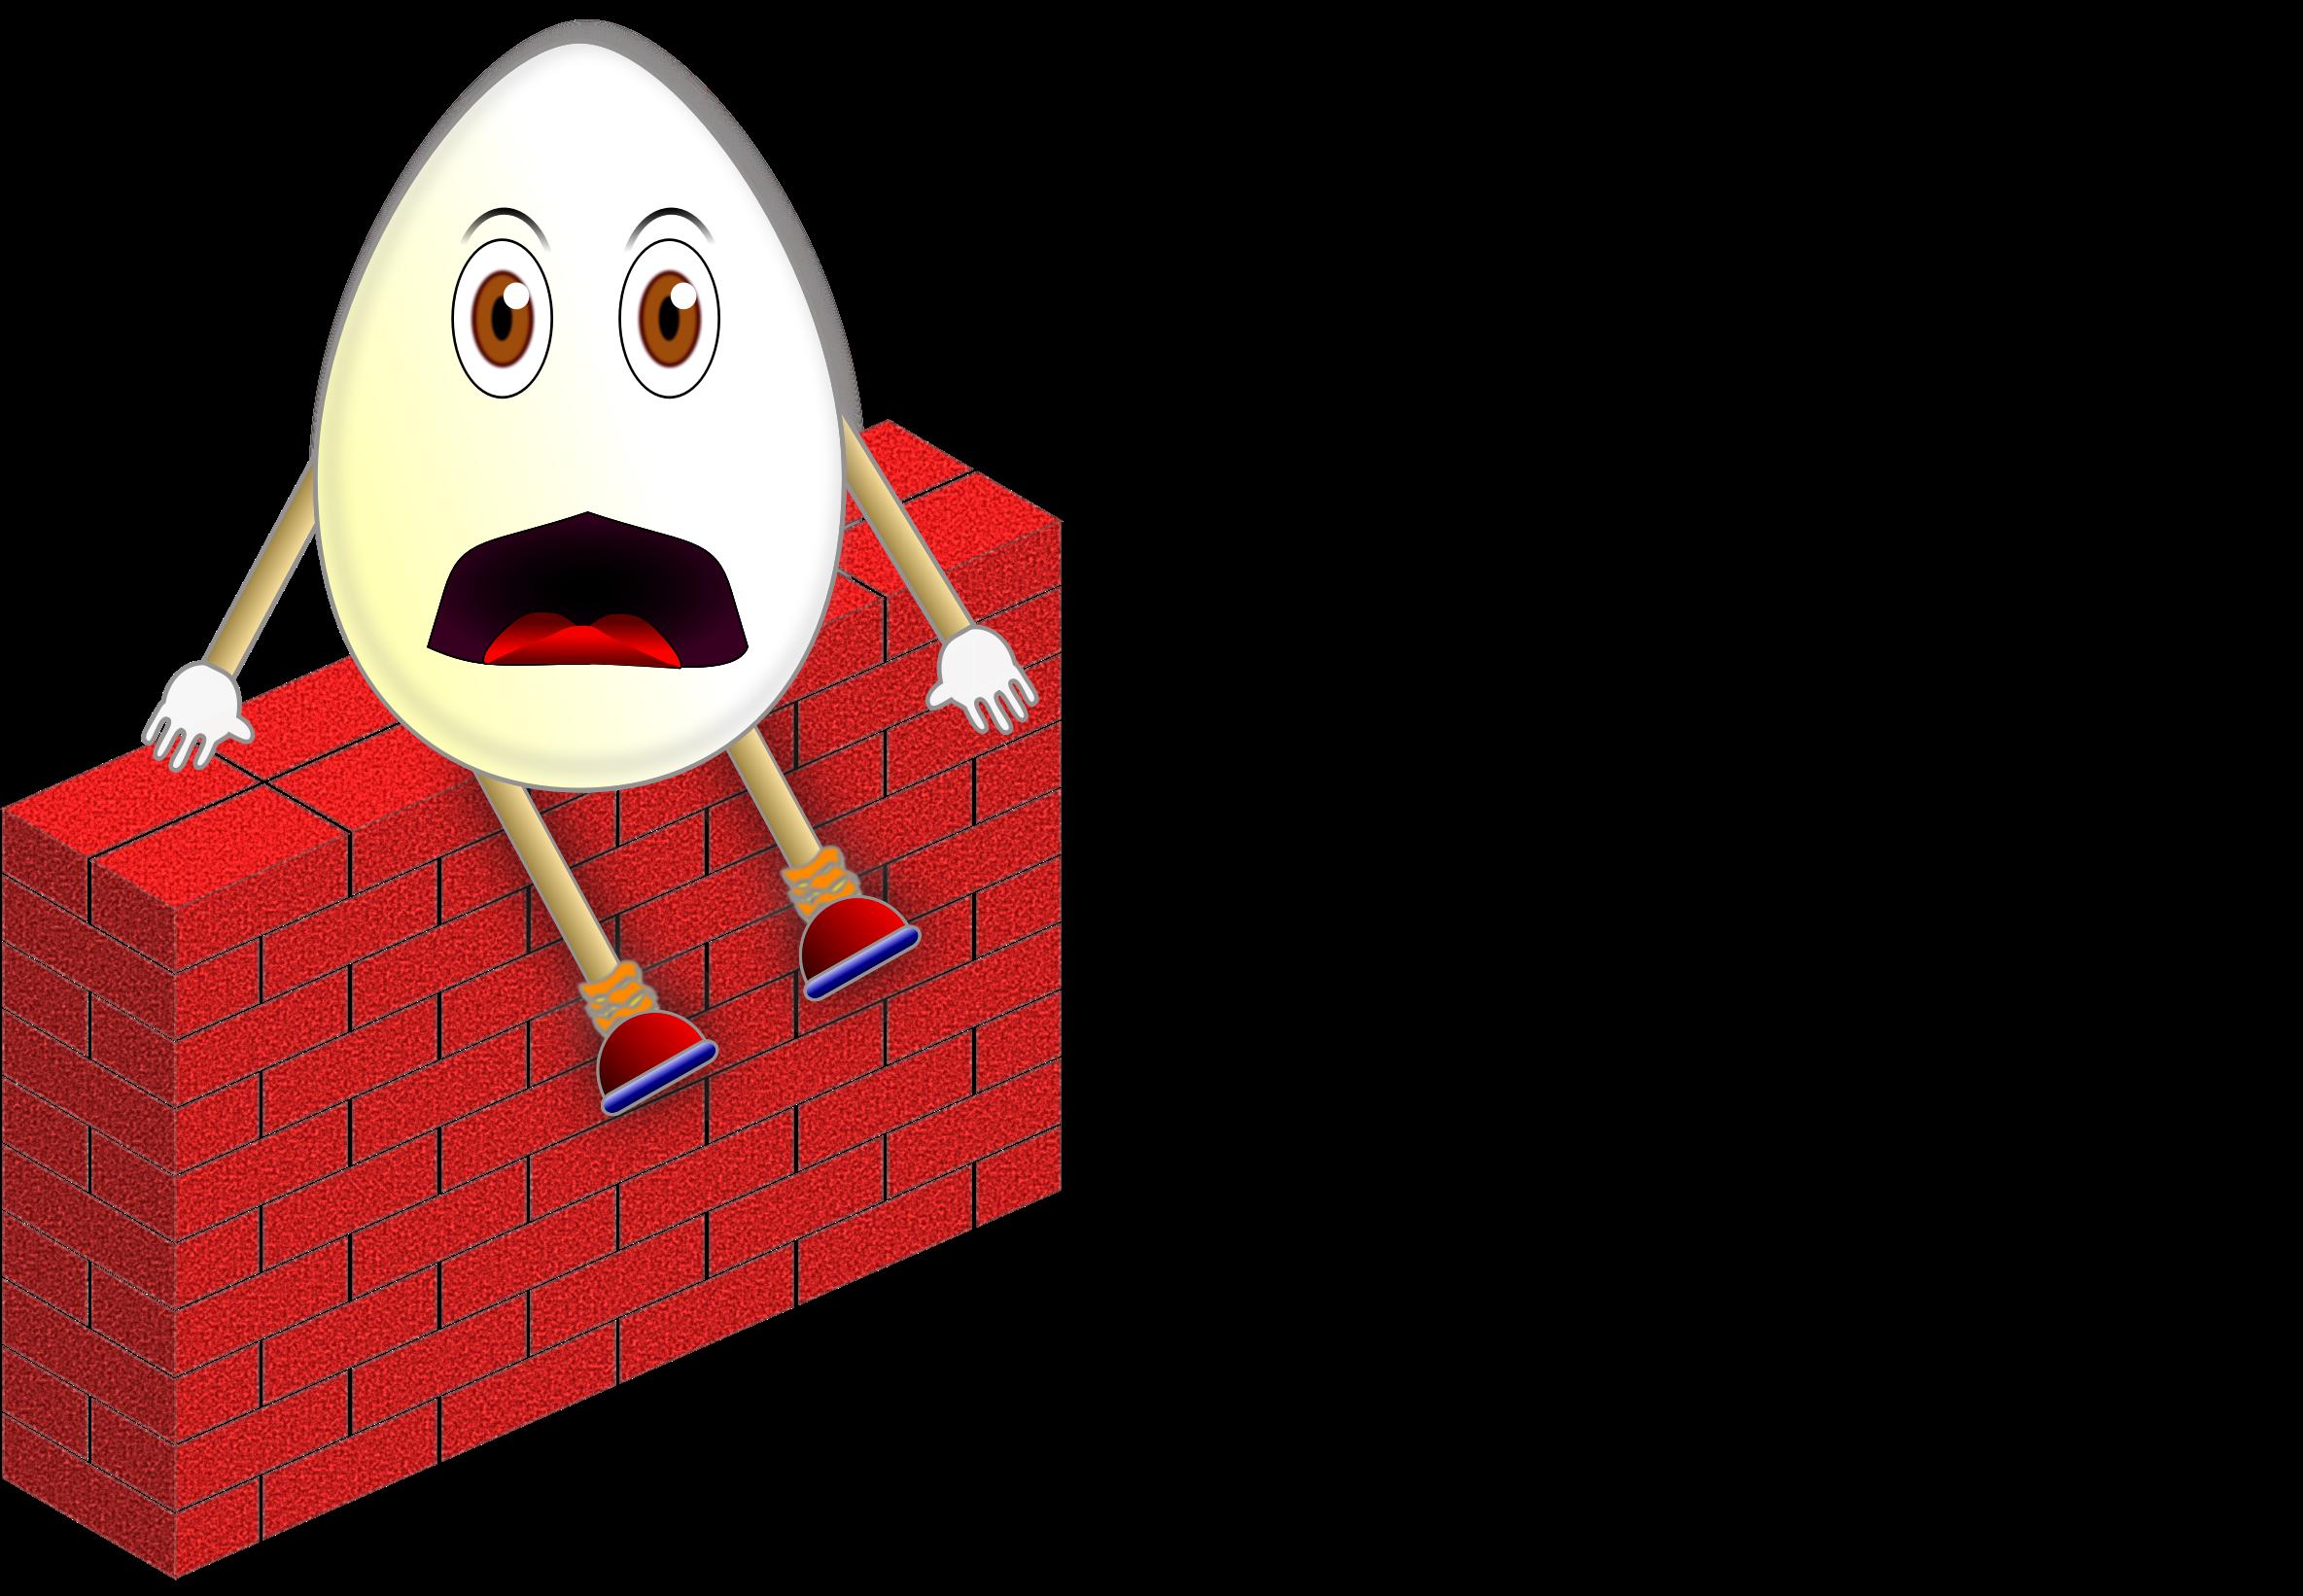 Parody big image png. Humpty dumpty clipart kingsman